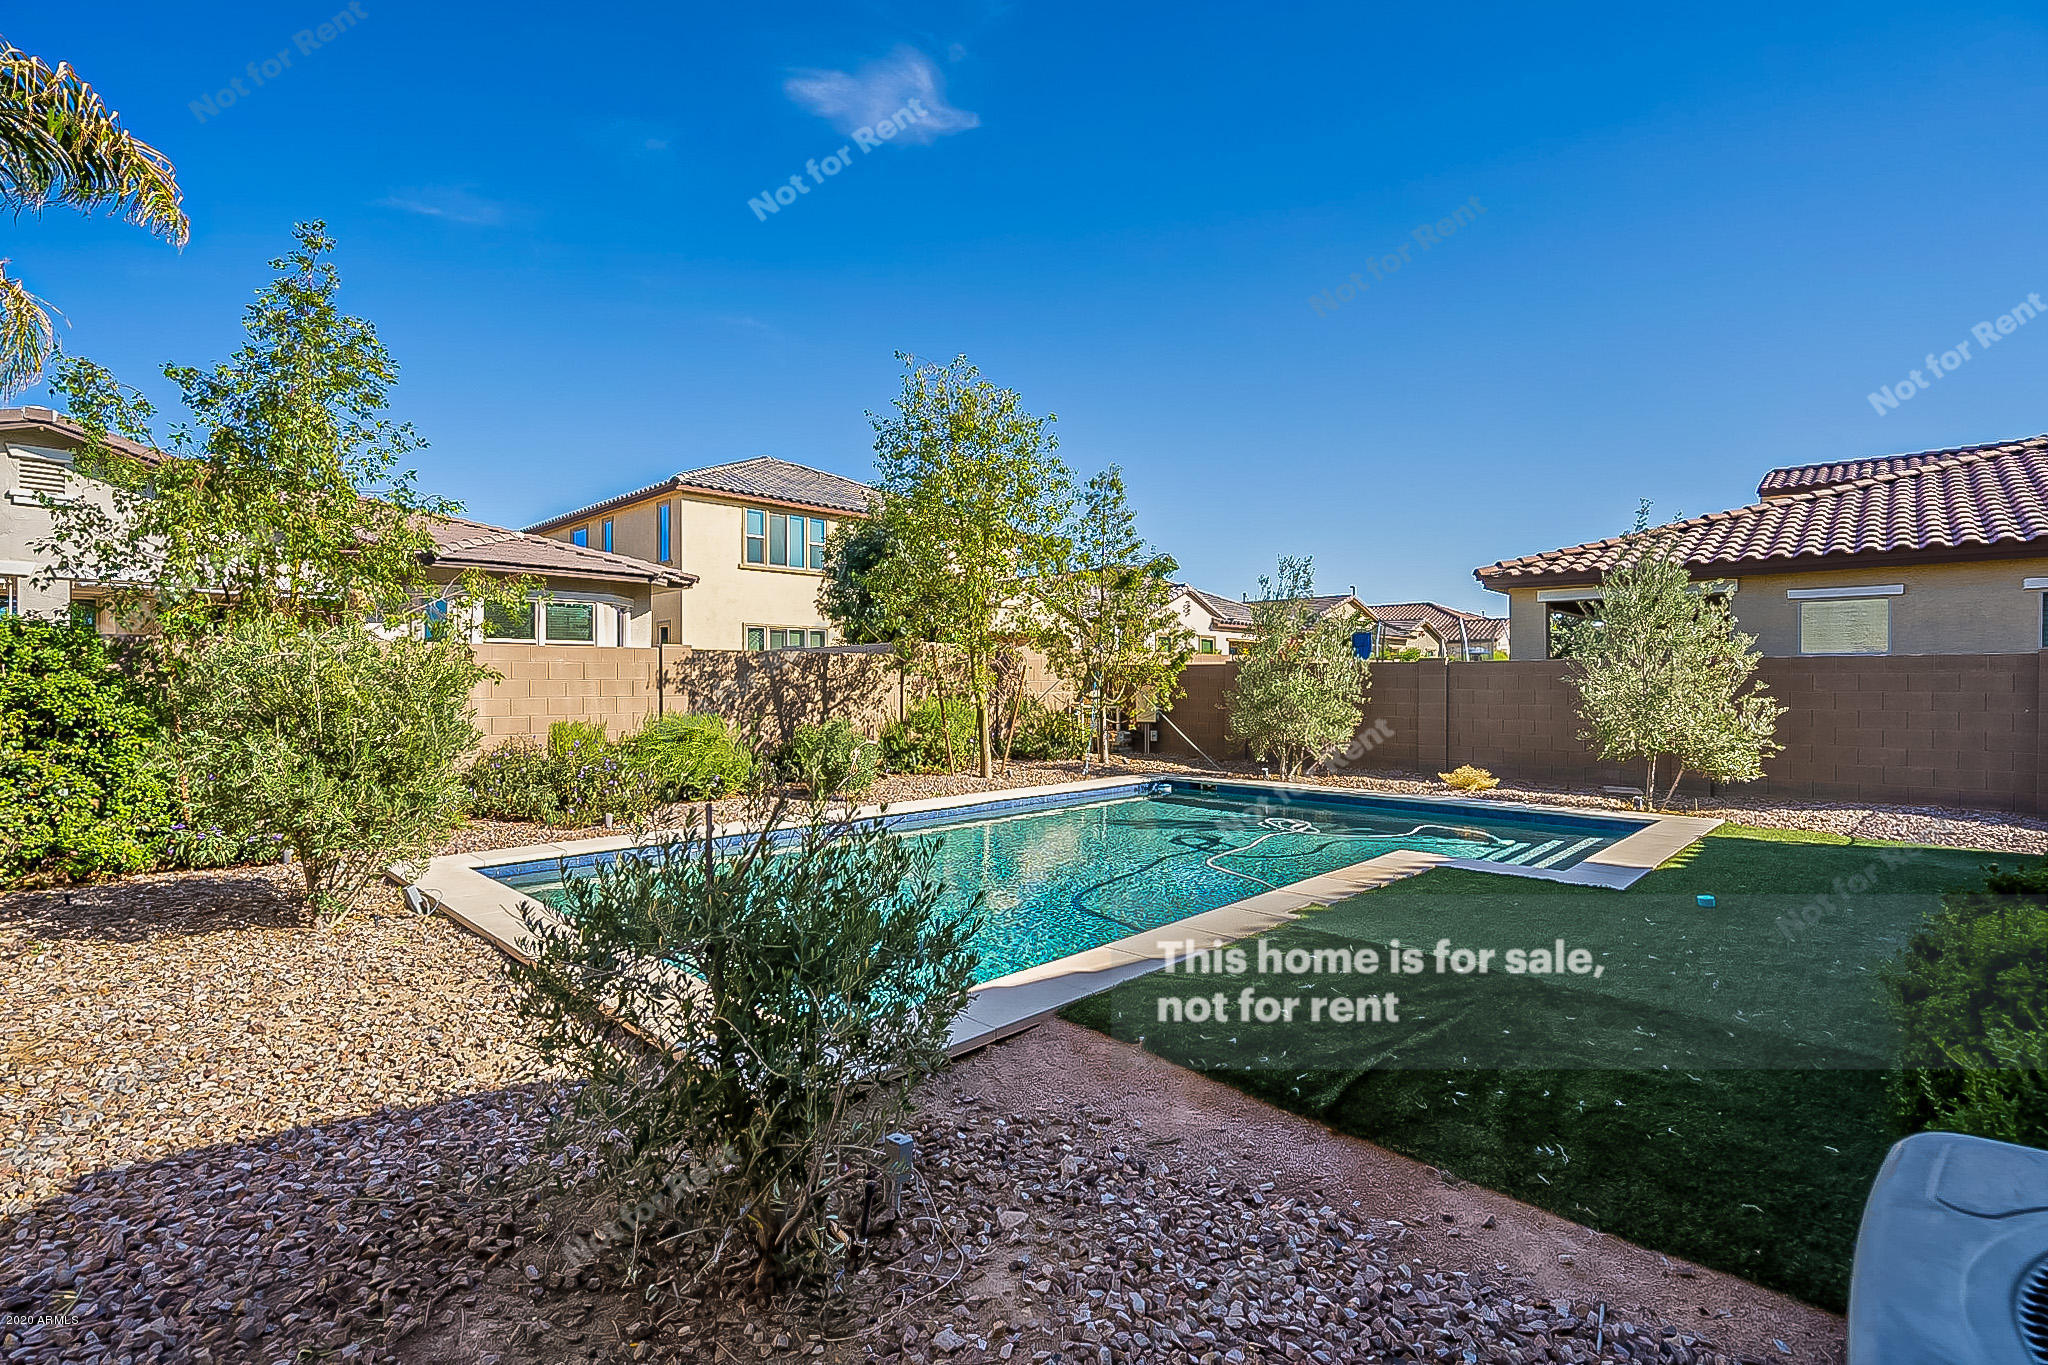 MLS 6157087 5429 S LUISENO Boulevard, Gilbert, AZ 85298 3 Bedrooms